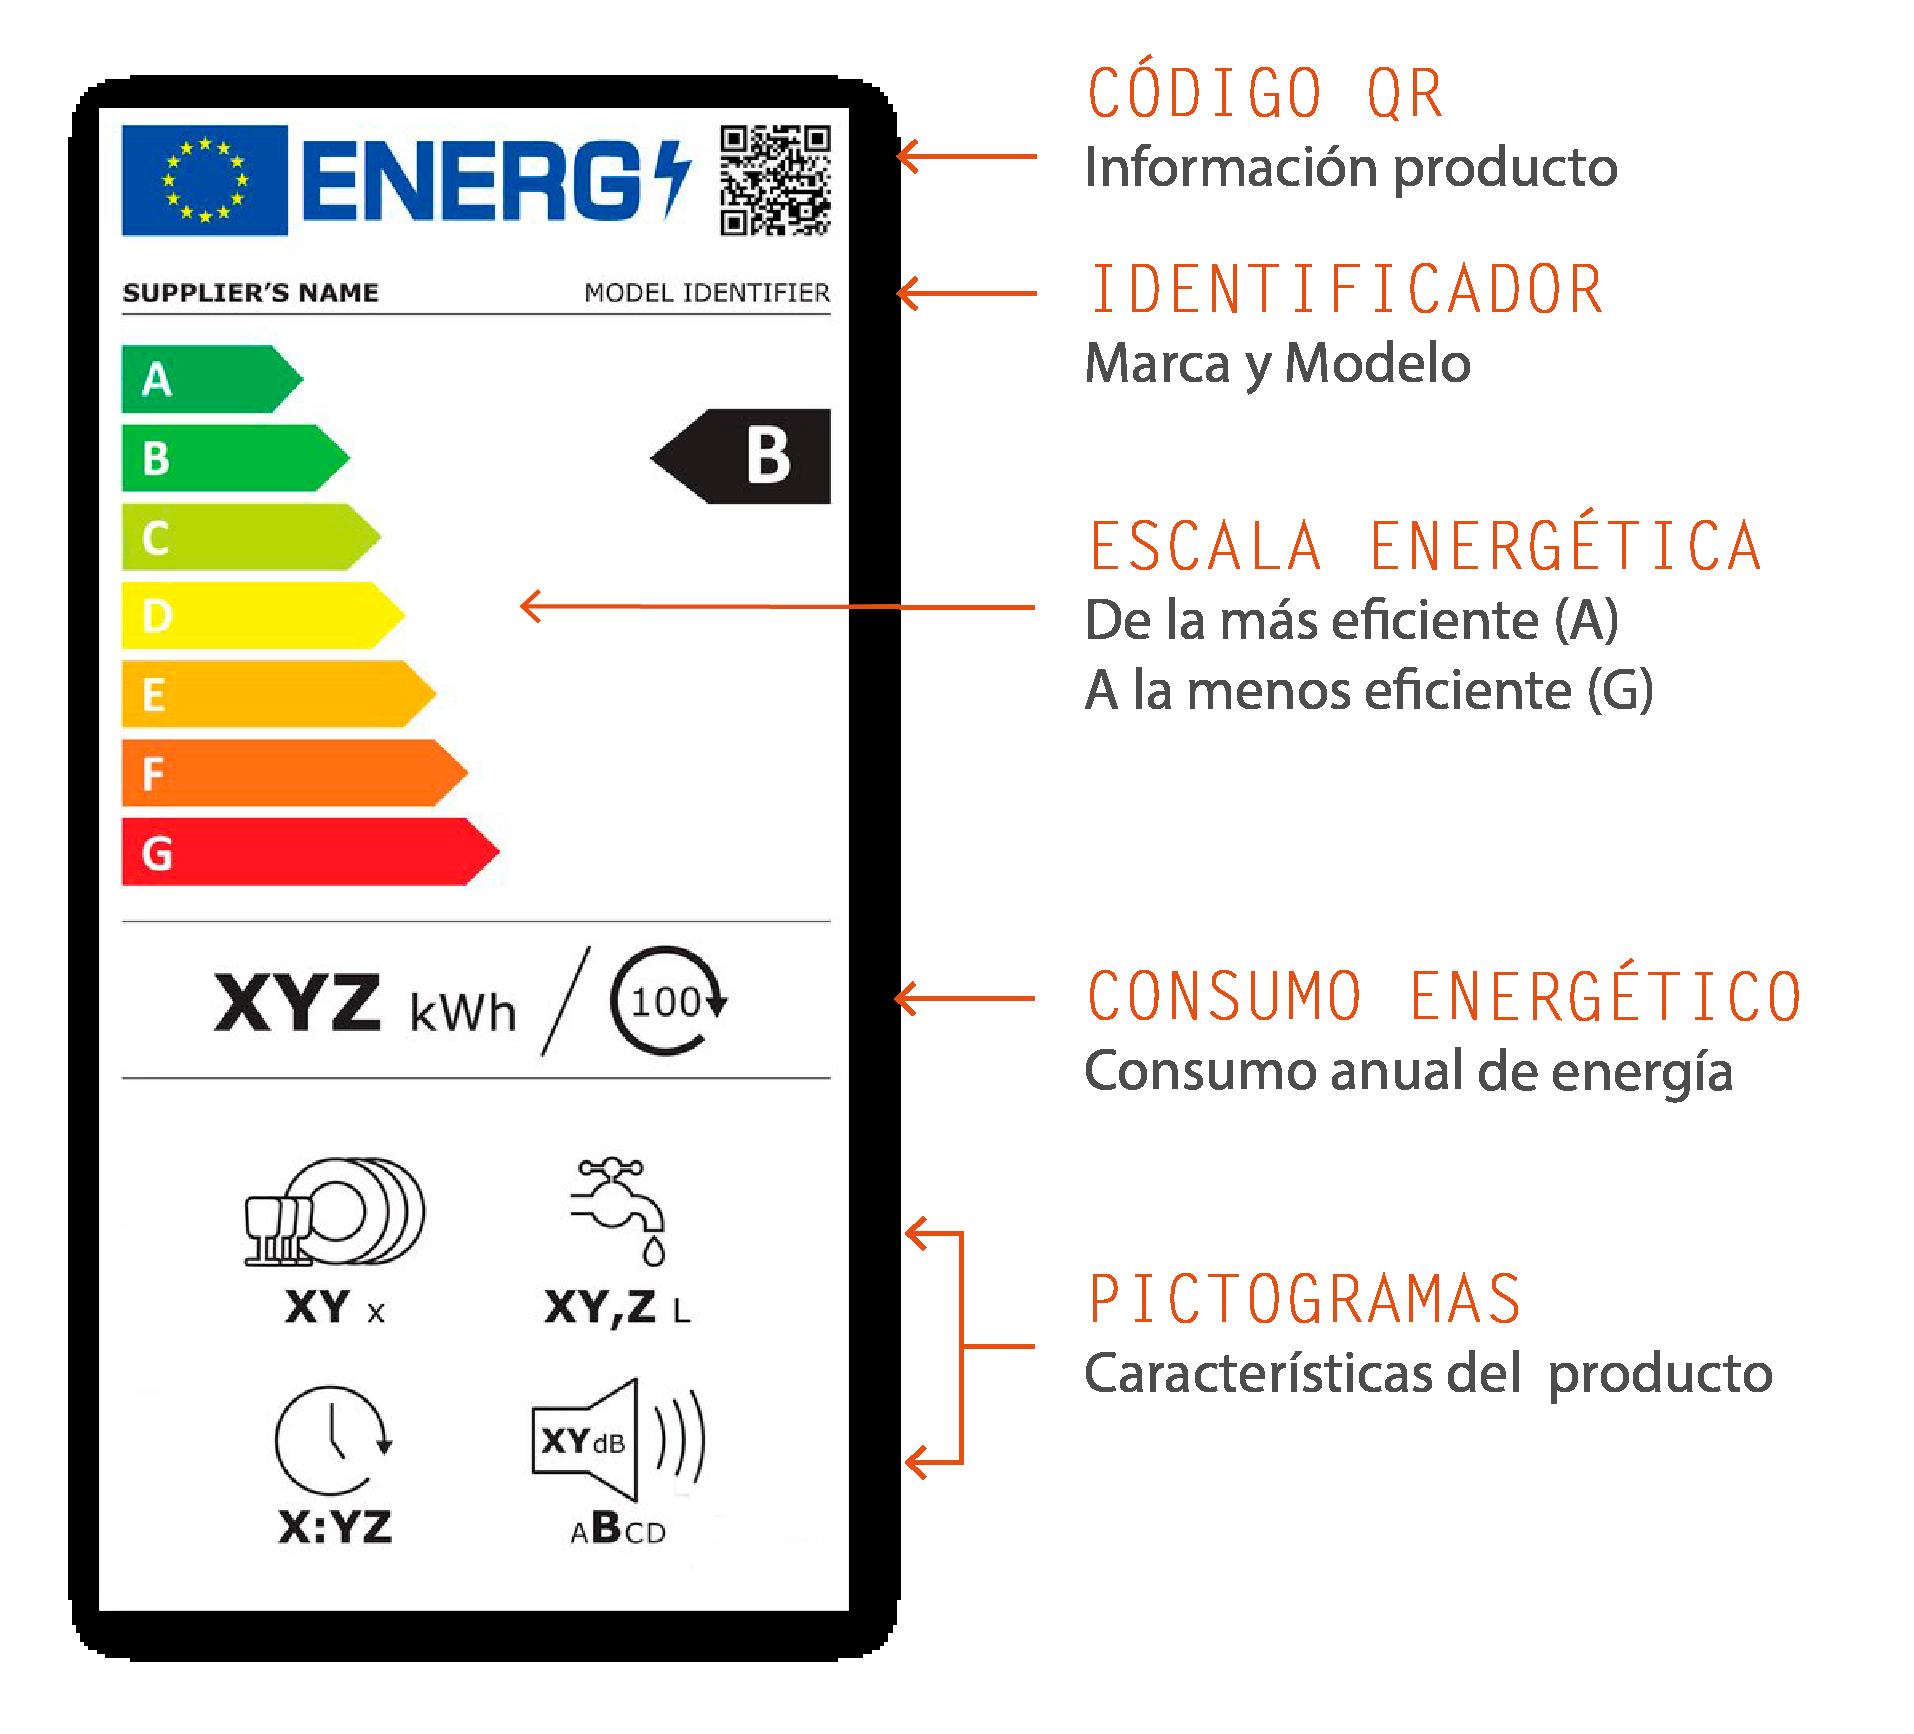 etiqueta energetica iluminación